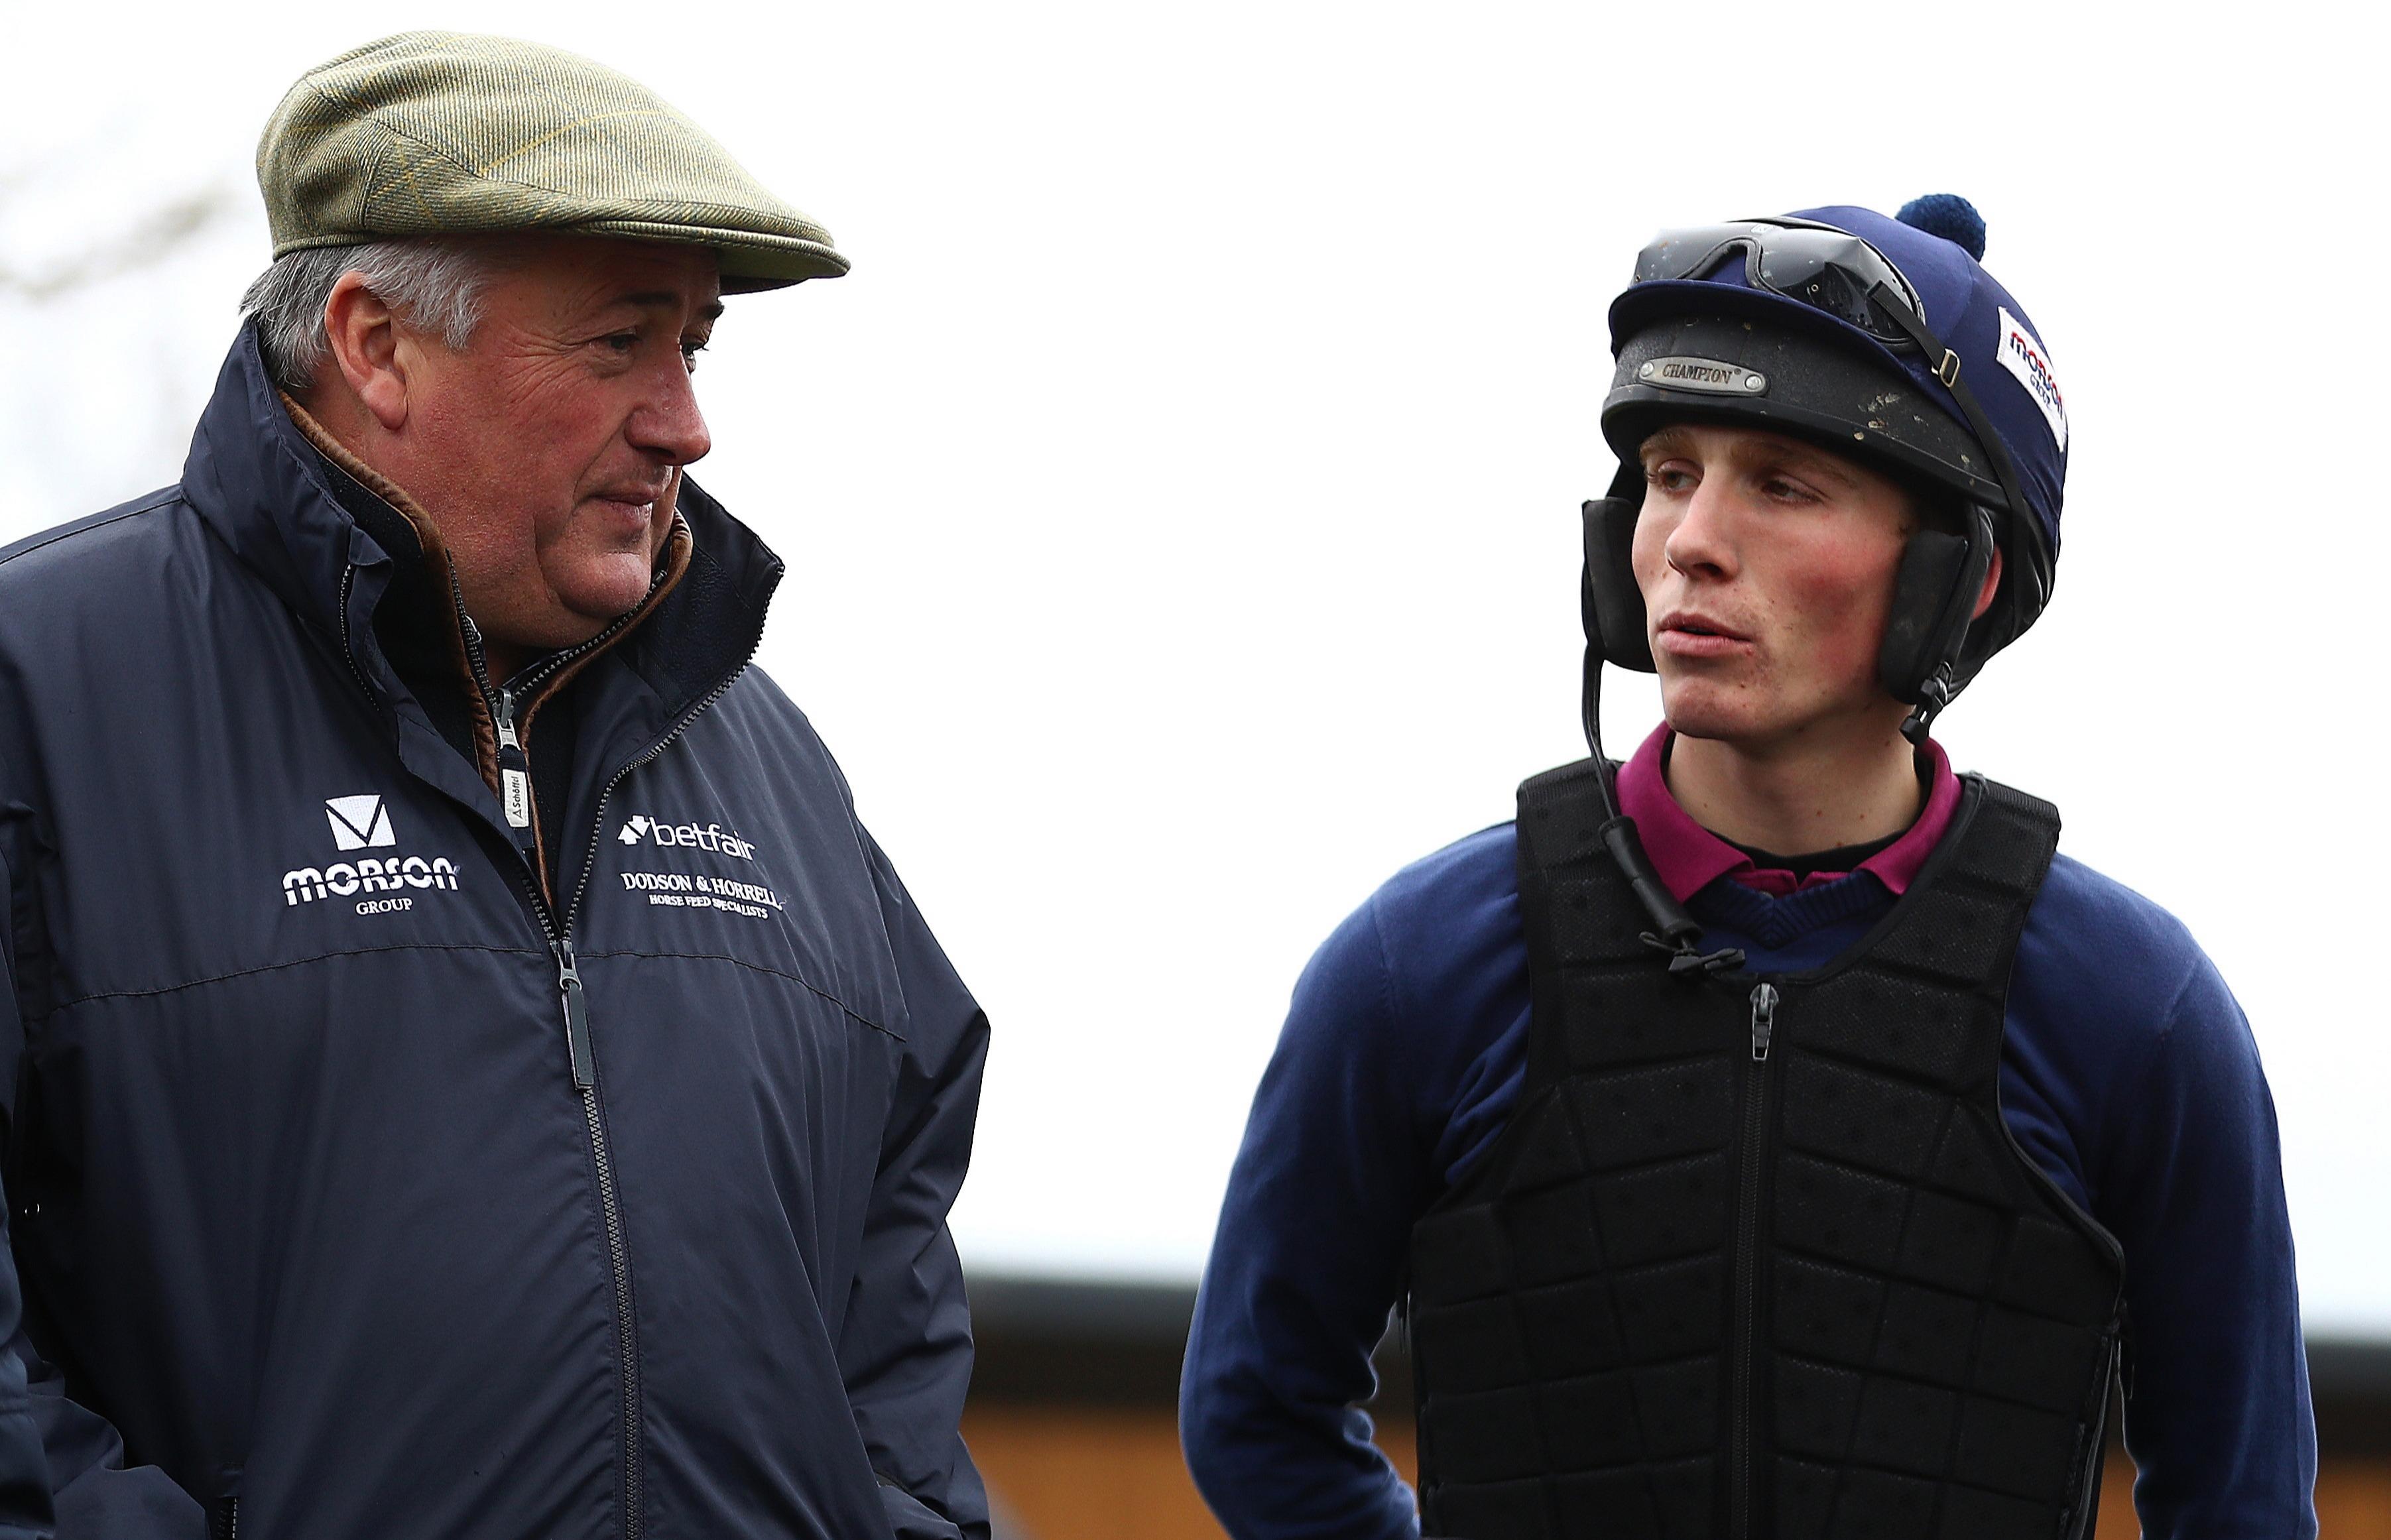 Harry Cobden going for broke in Jockeys Championship – Paul Nicholls number one on the season ahead